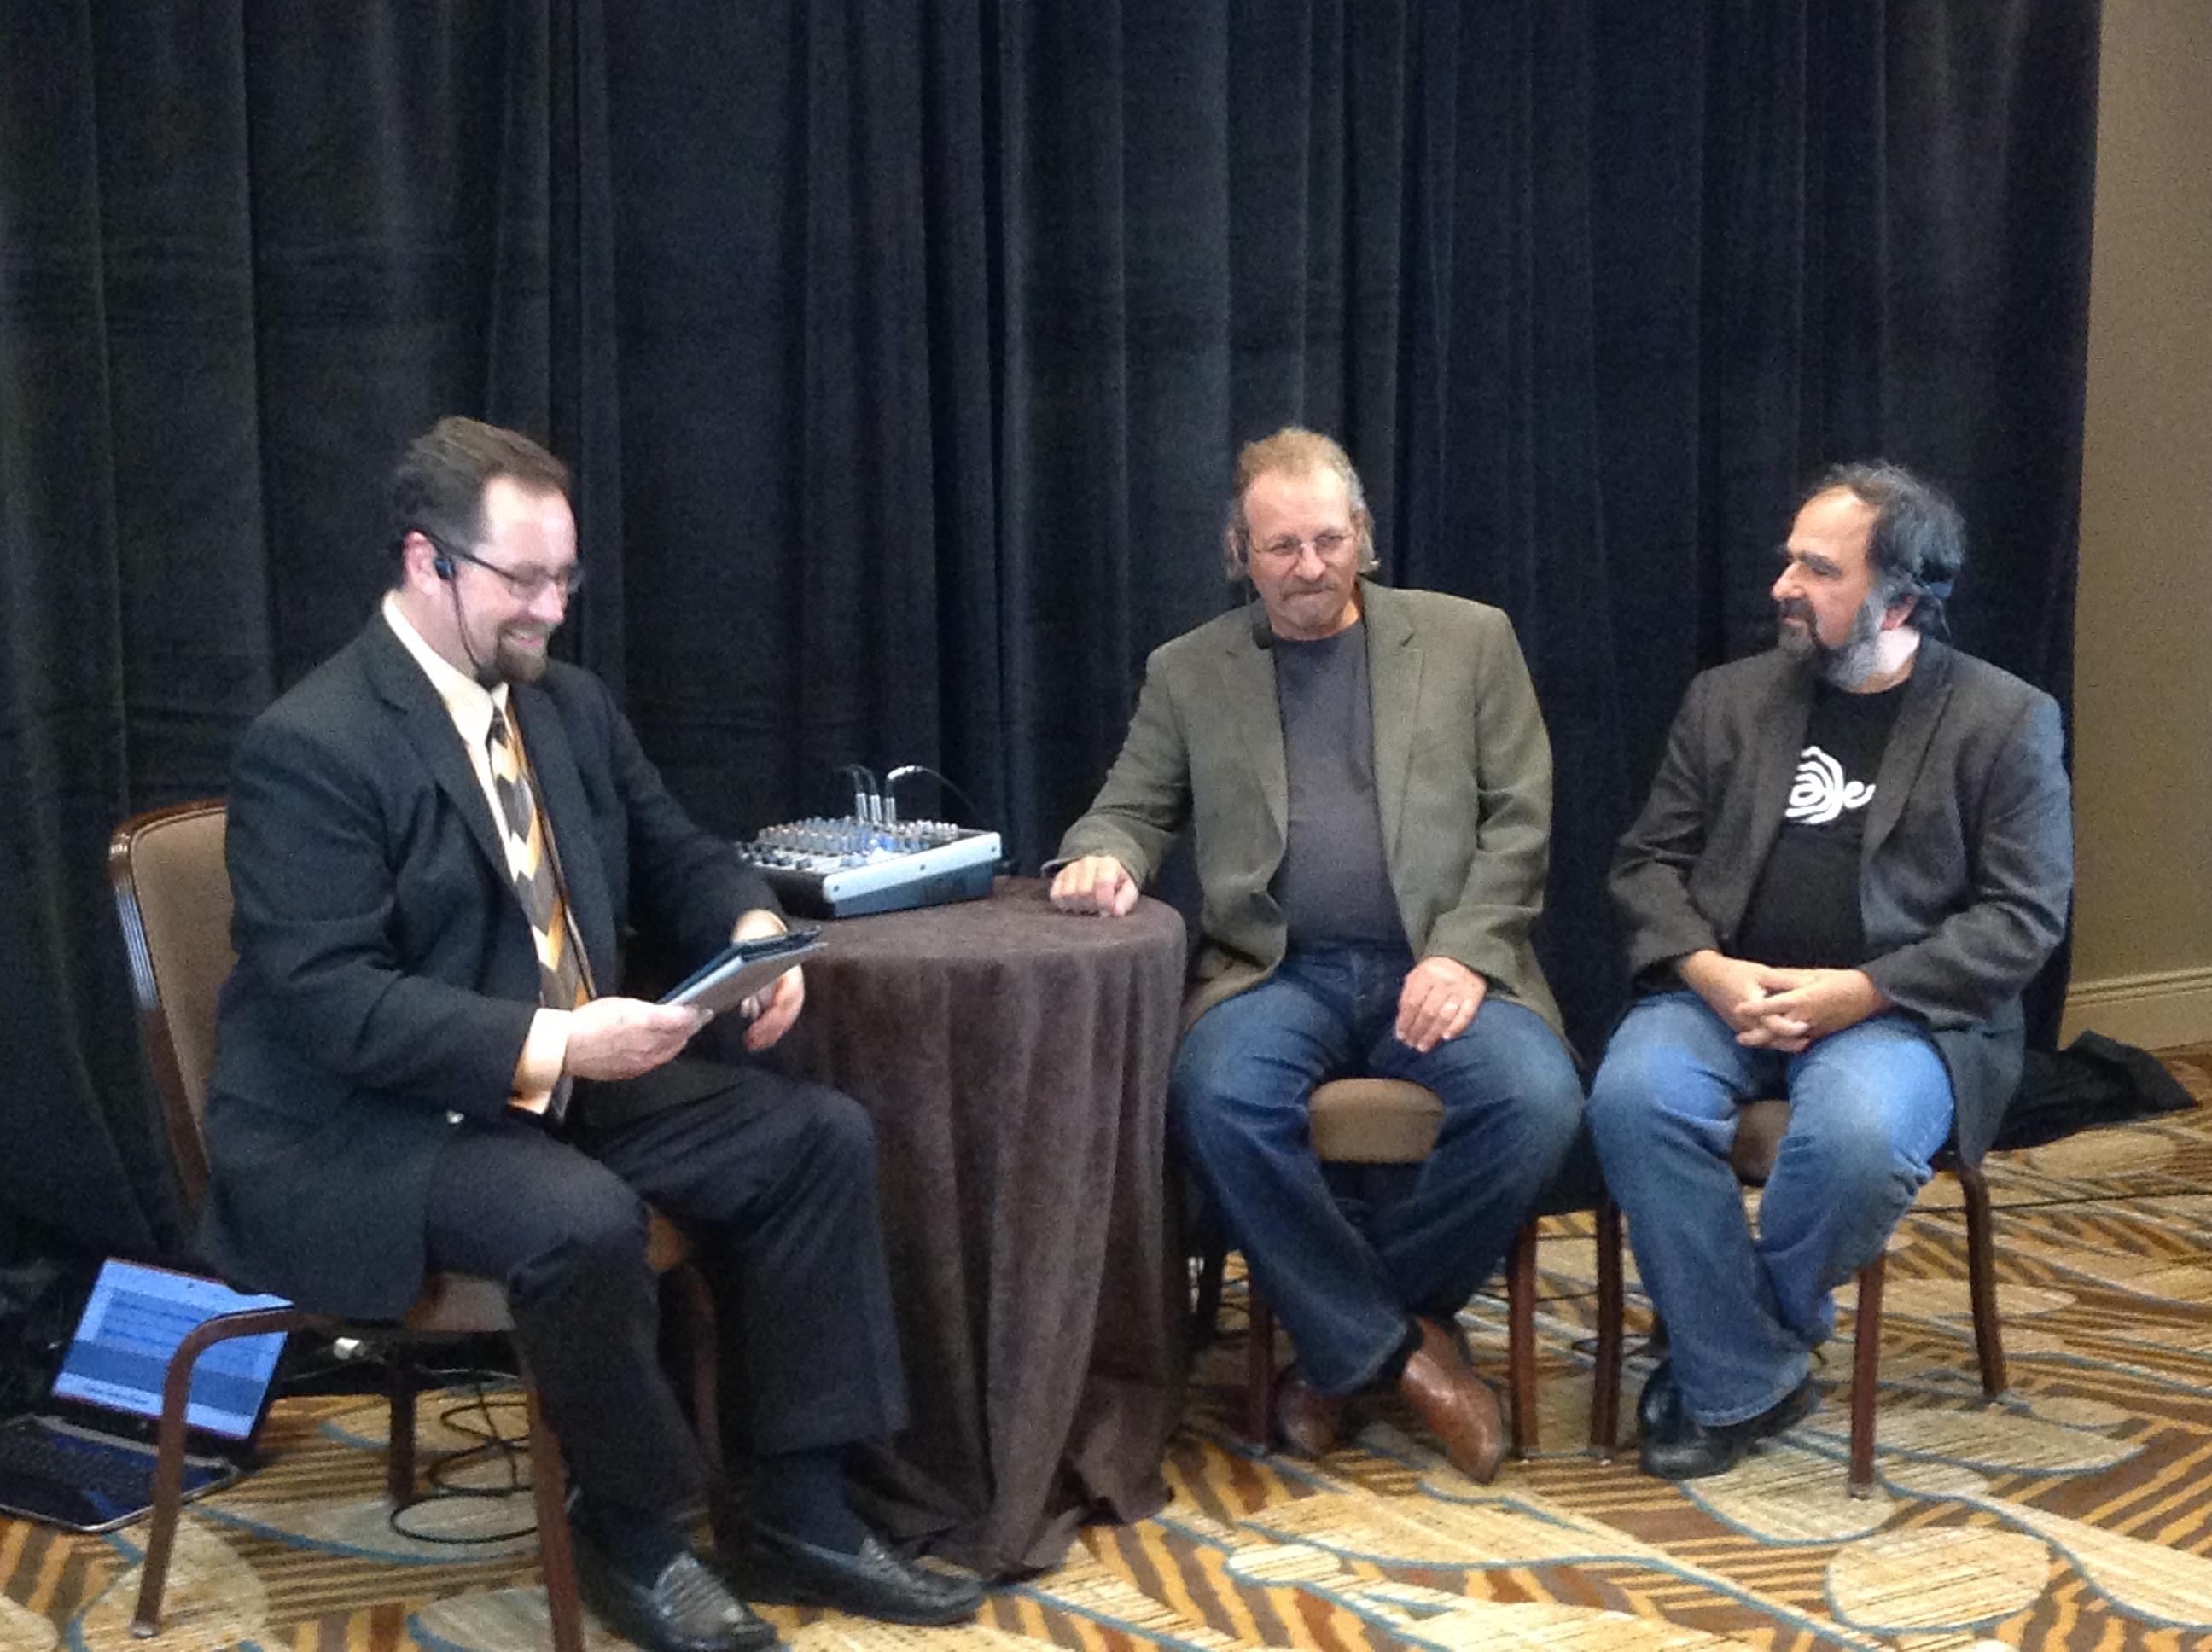 Gilbert, Marzulli and Shaw